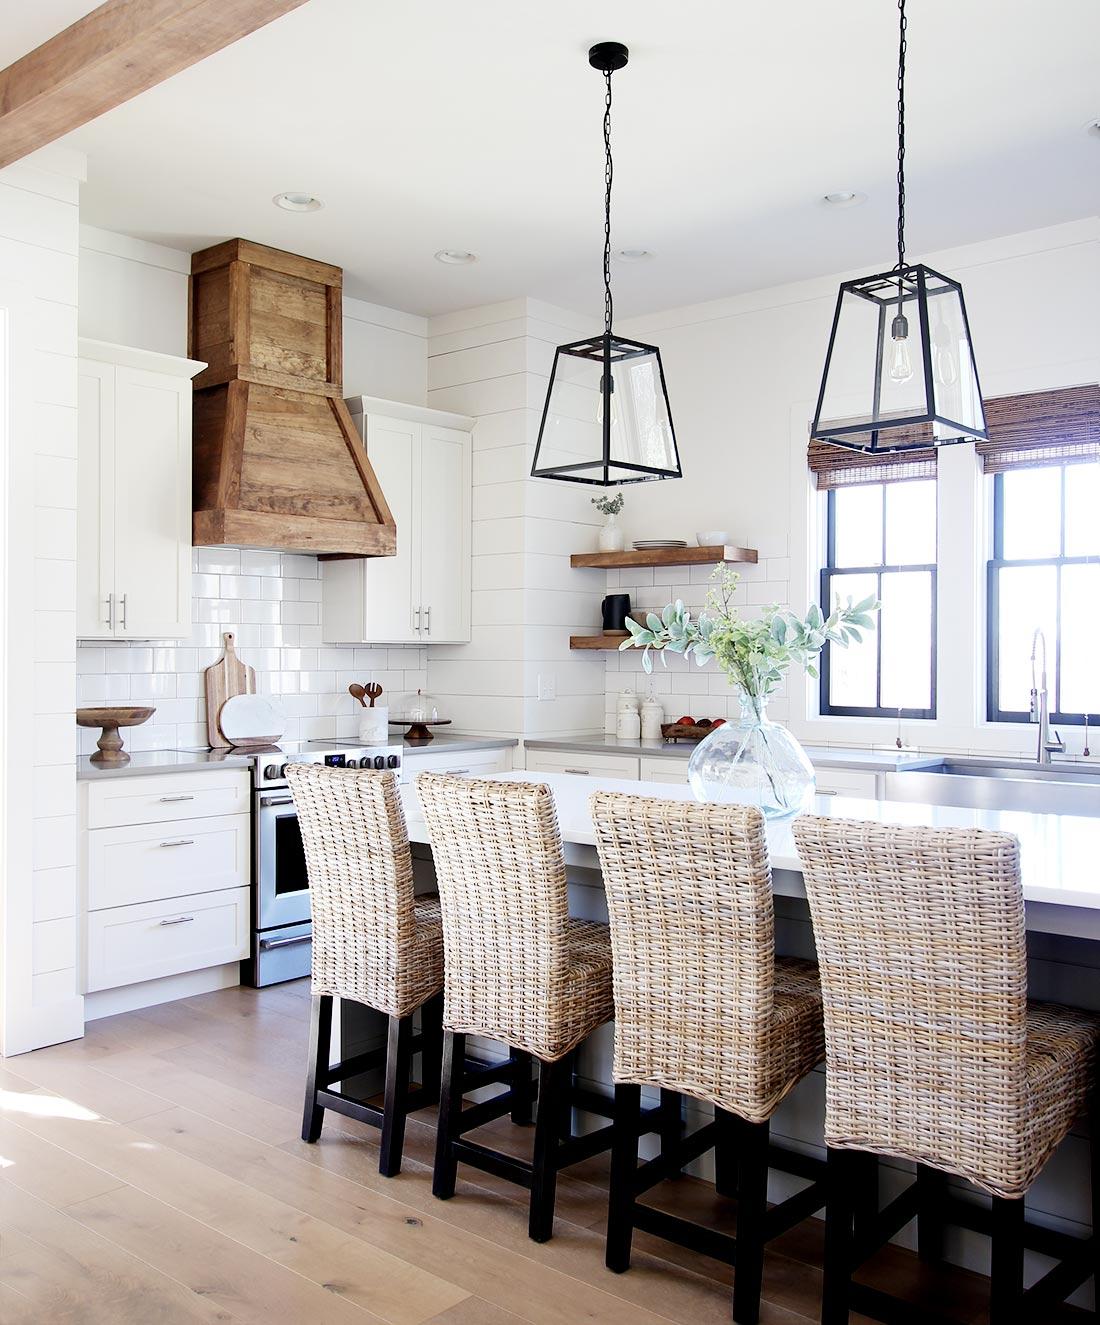 How To Build A Farmhouse Wood Range Hood